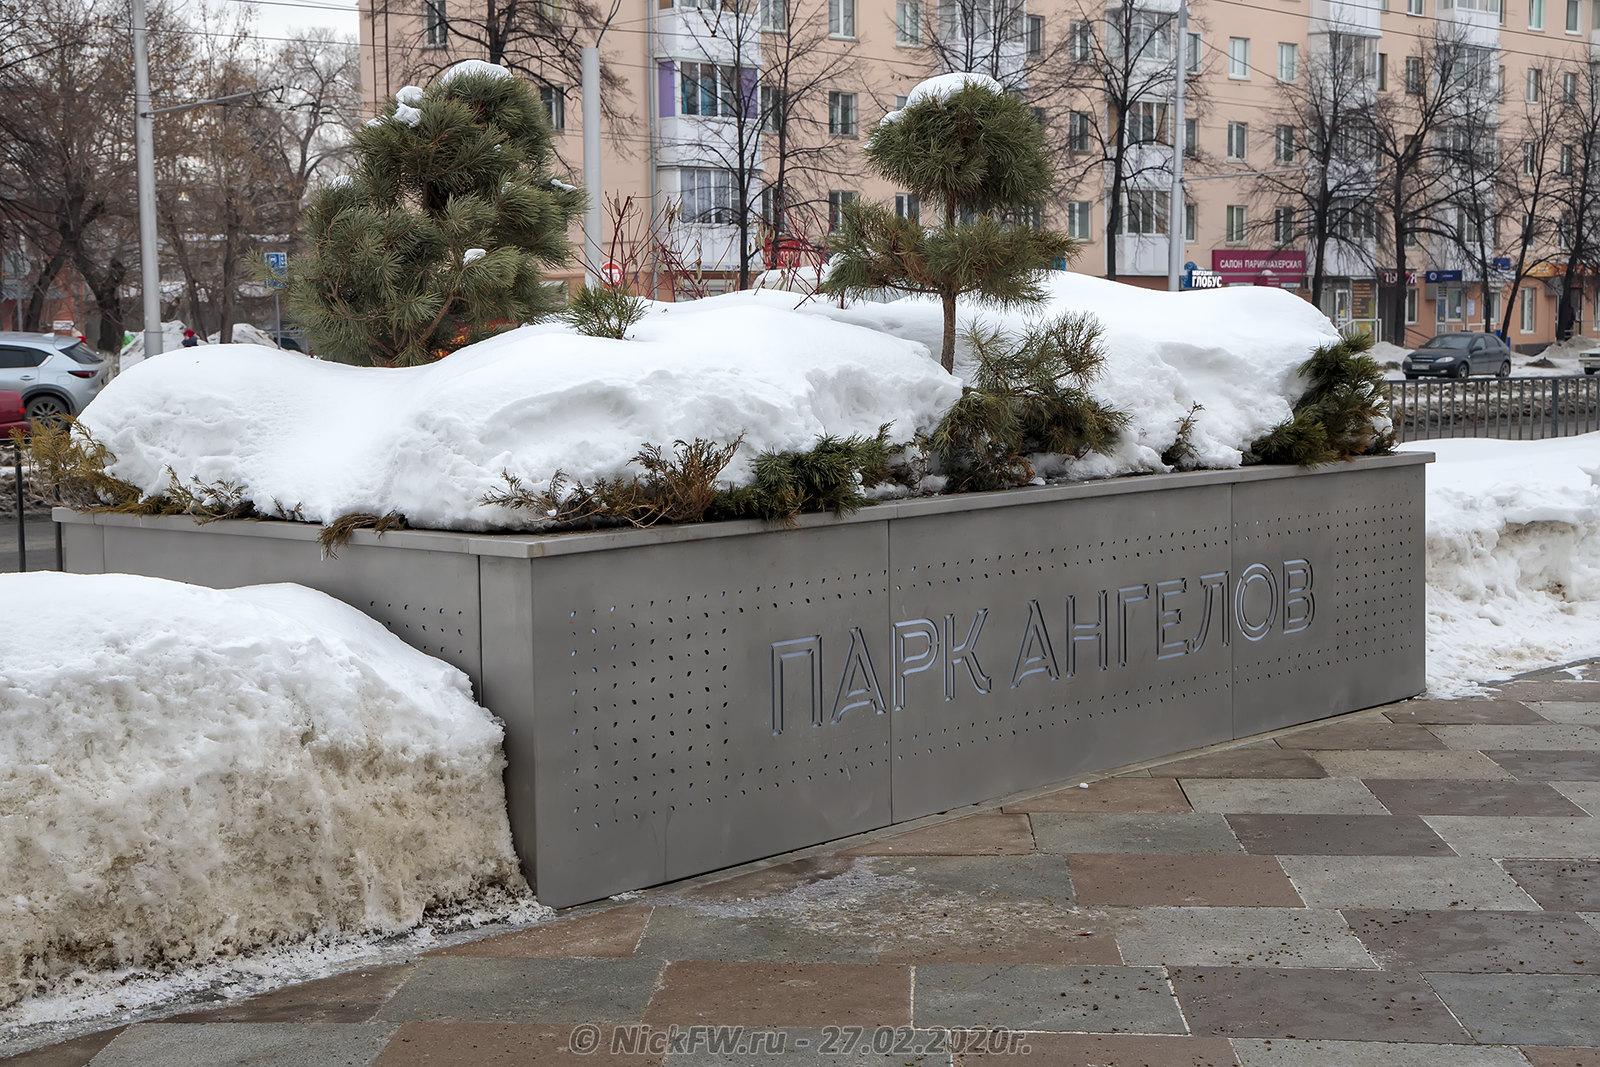 1. Парк Ангелов © NickFW.ru - 27.02.2020г.